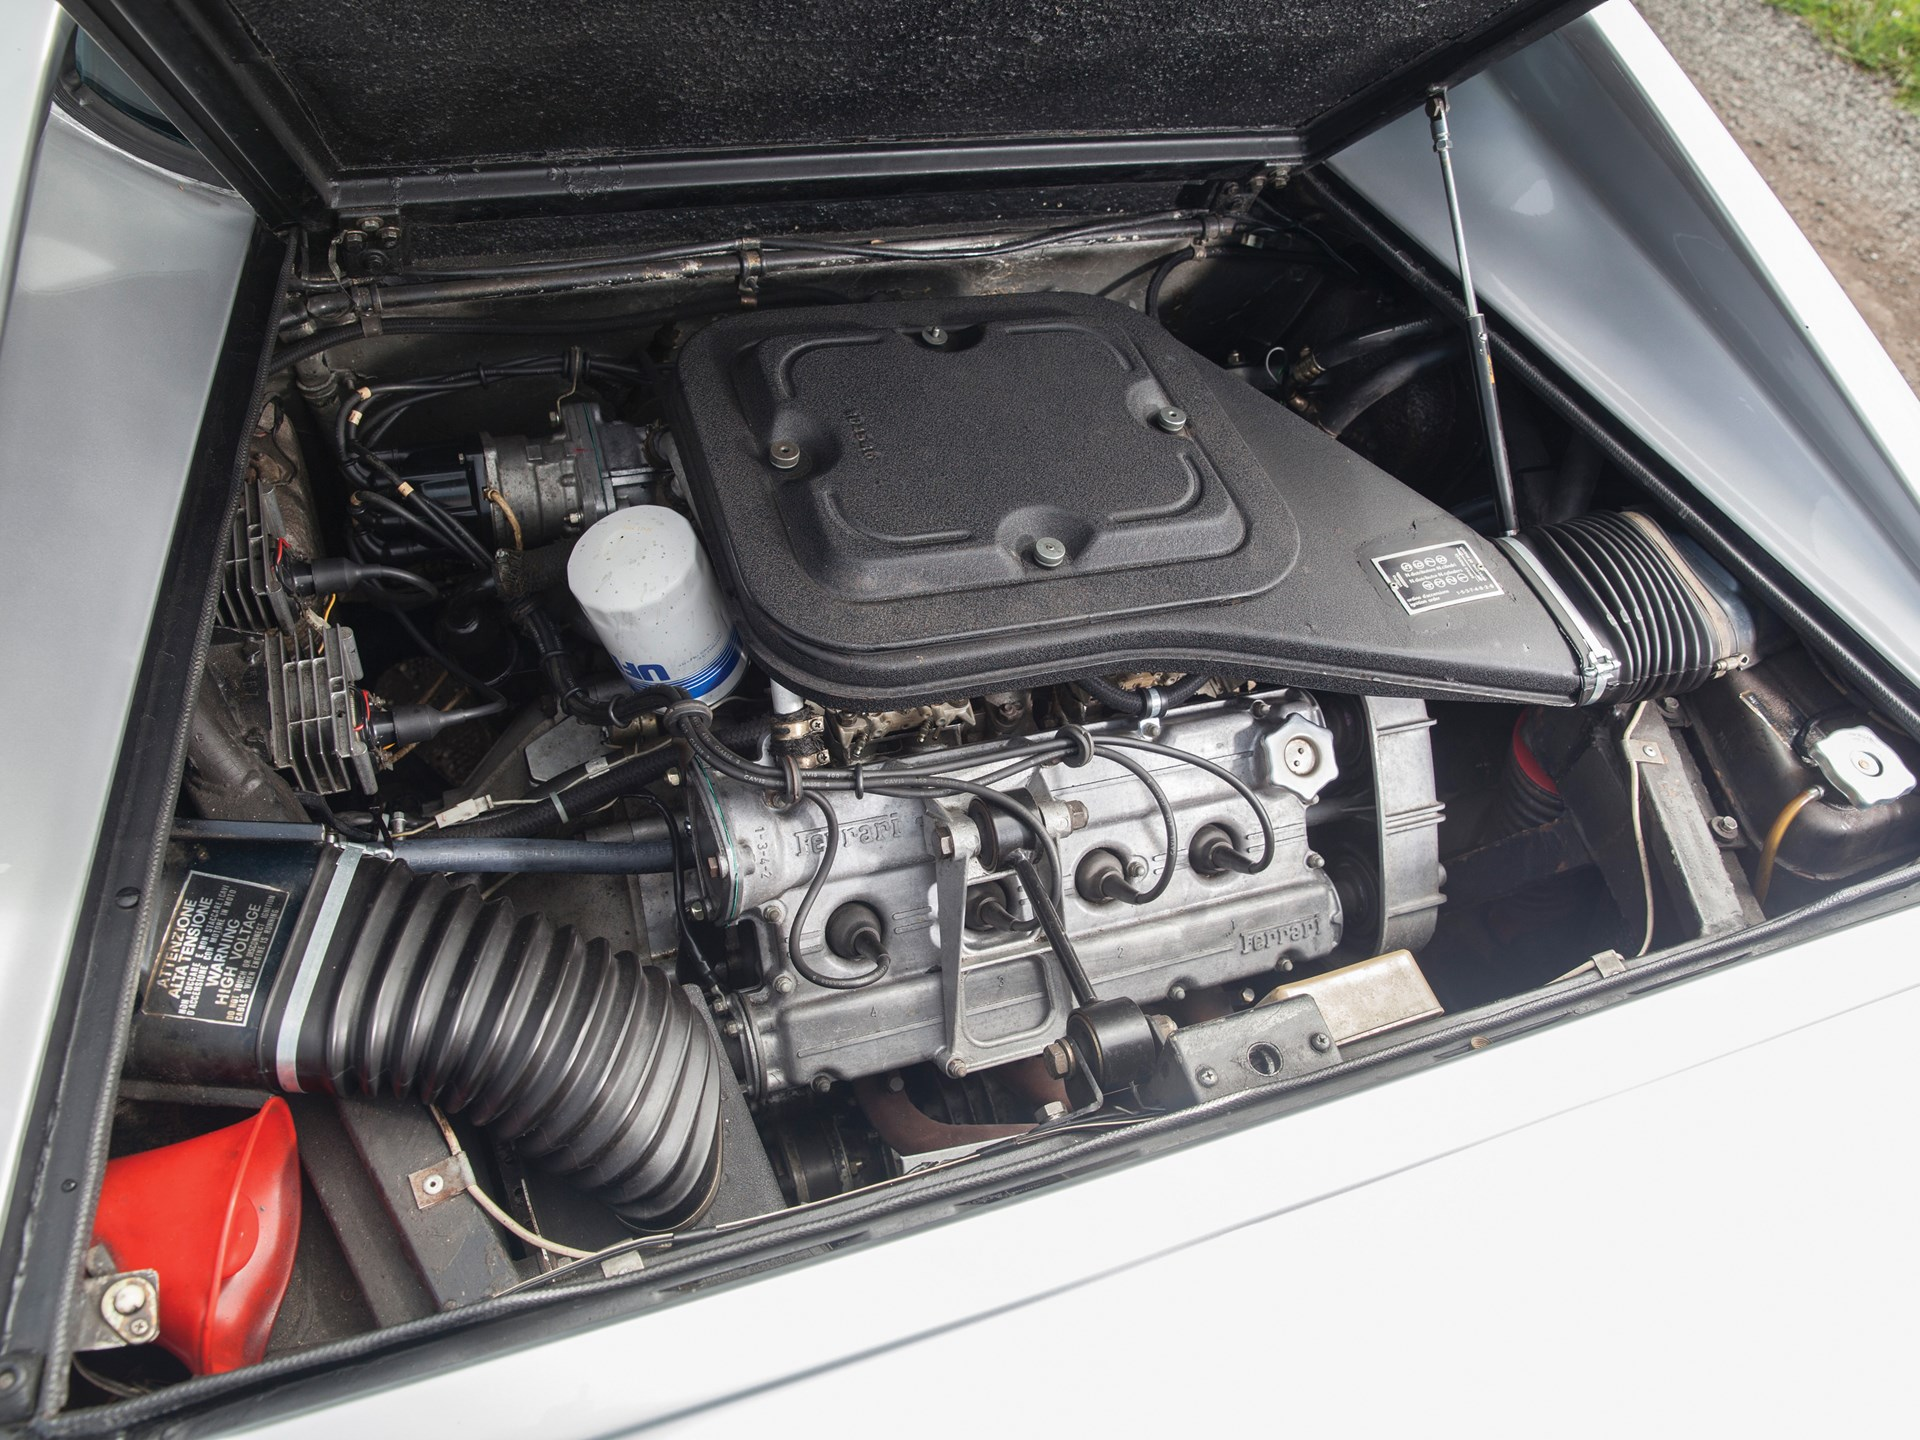 1979 Ferrari 308GT/4 engine